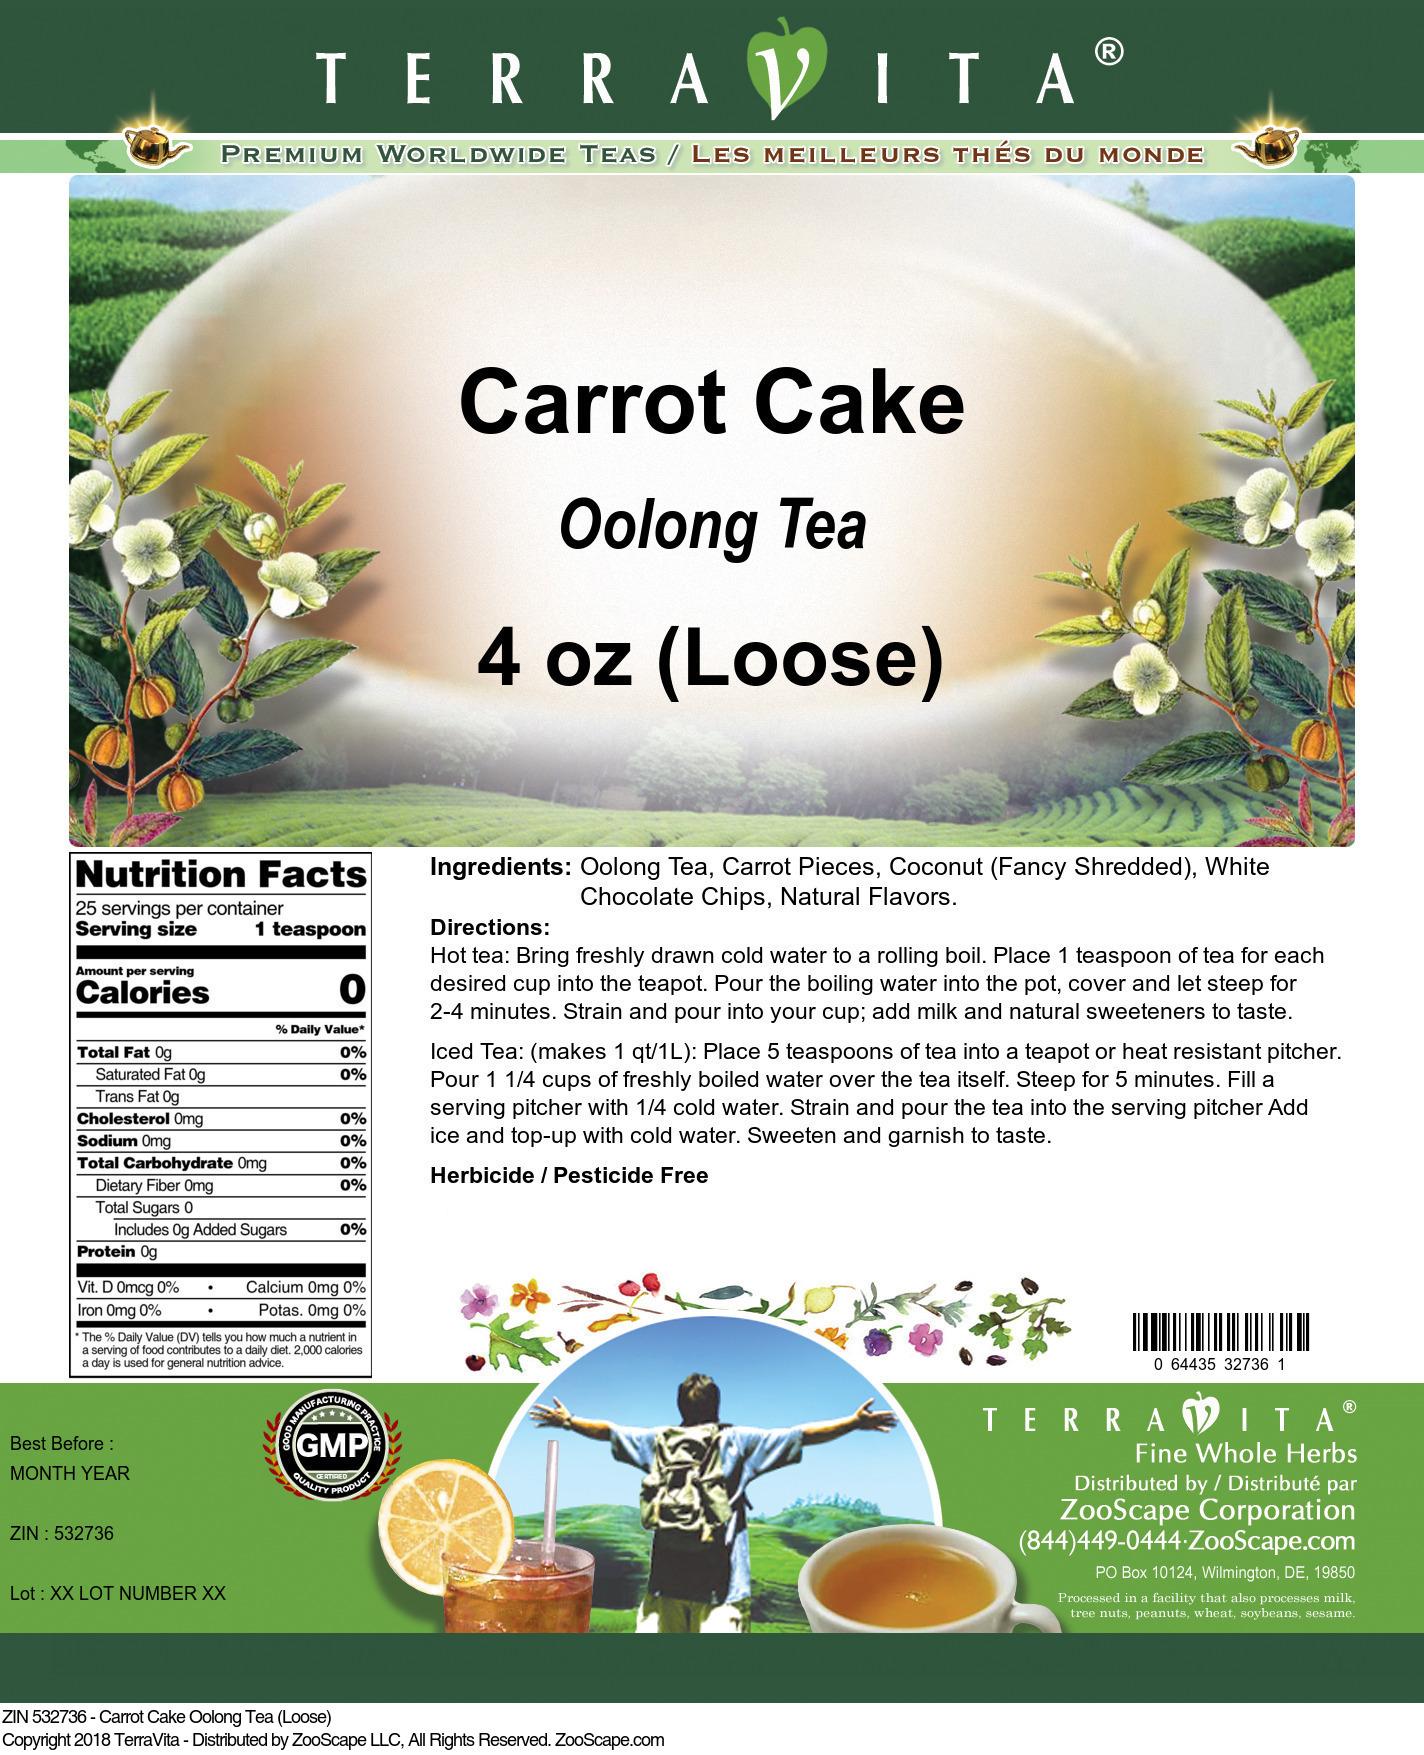 Carrot Cake Oolong Tea